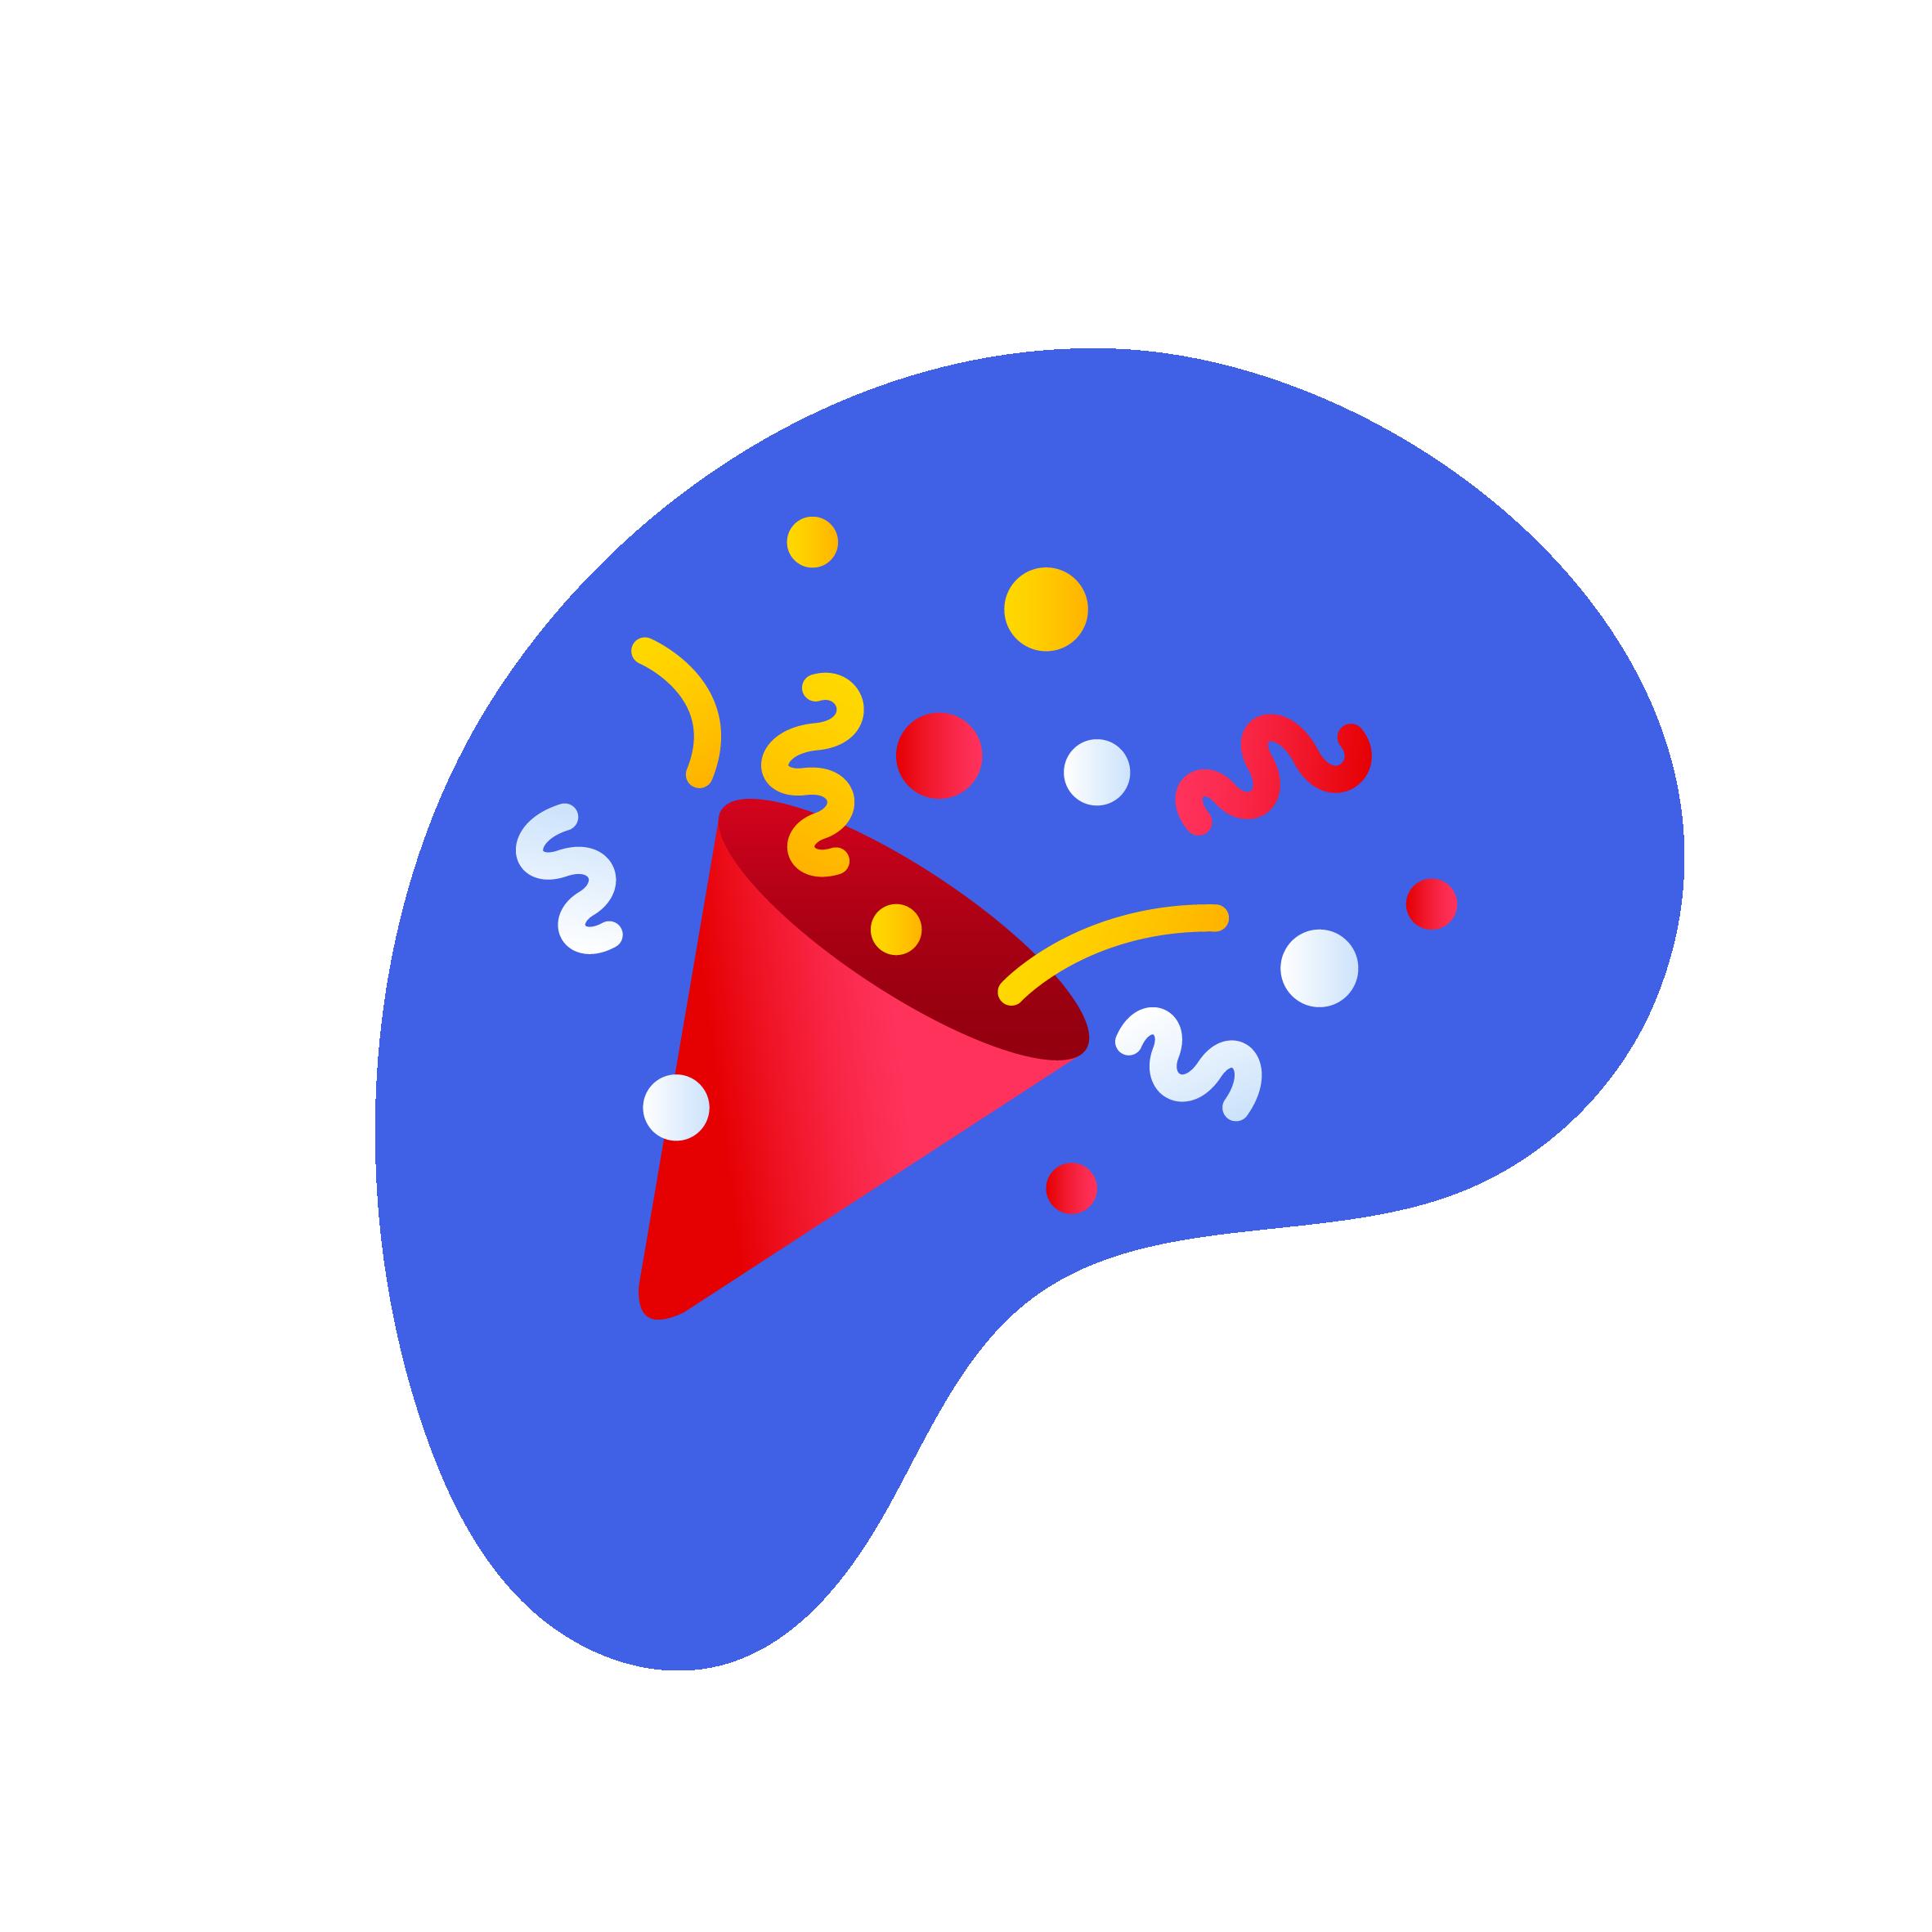 ikon som viser festlig stemning